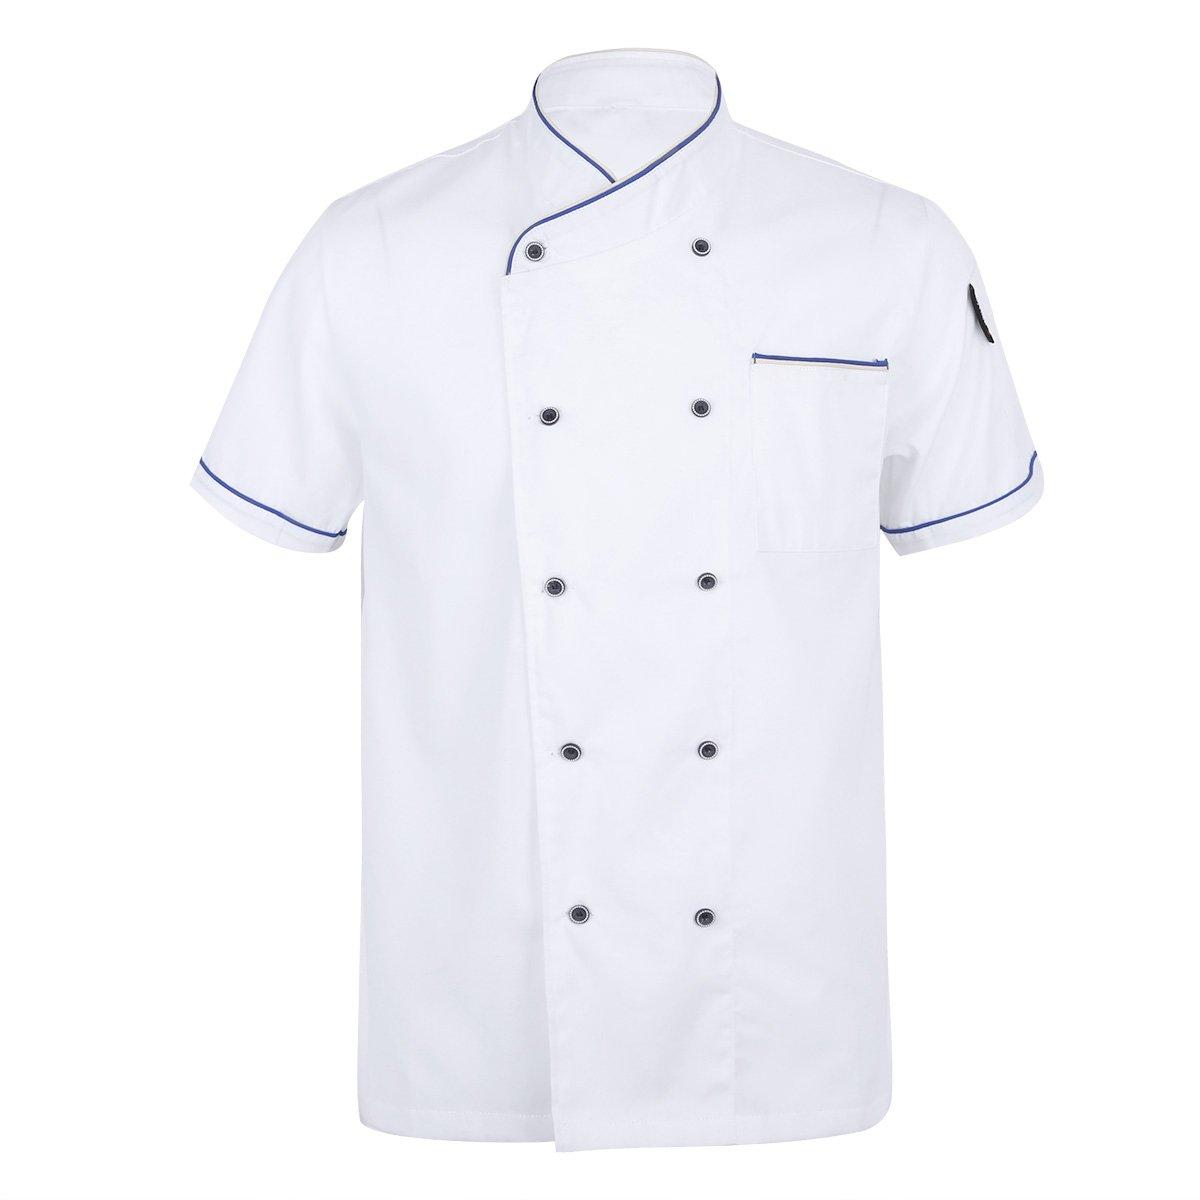 CHICTRY Short Sleeve Chef Coat Jacket Cooker Uniform